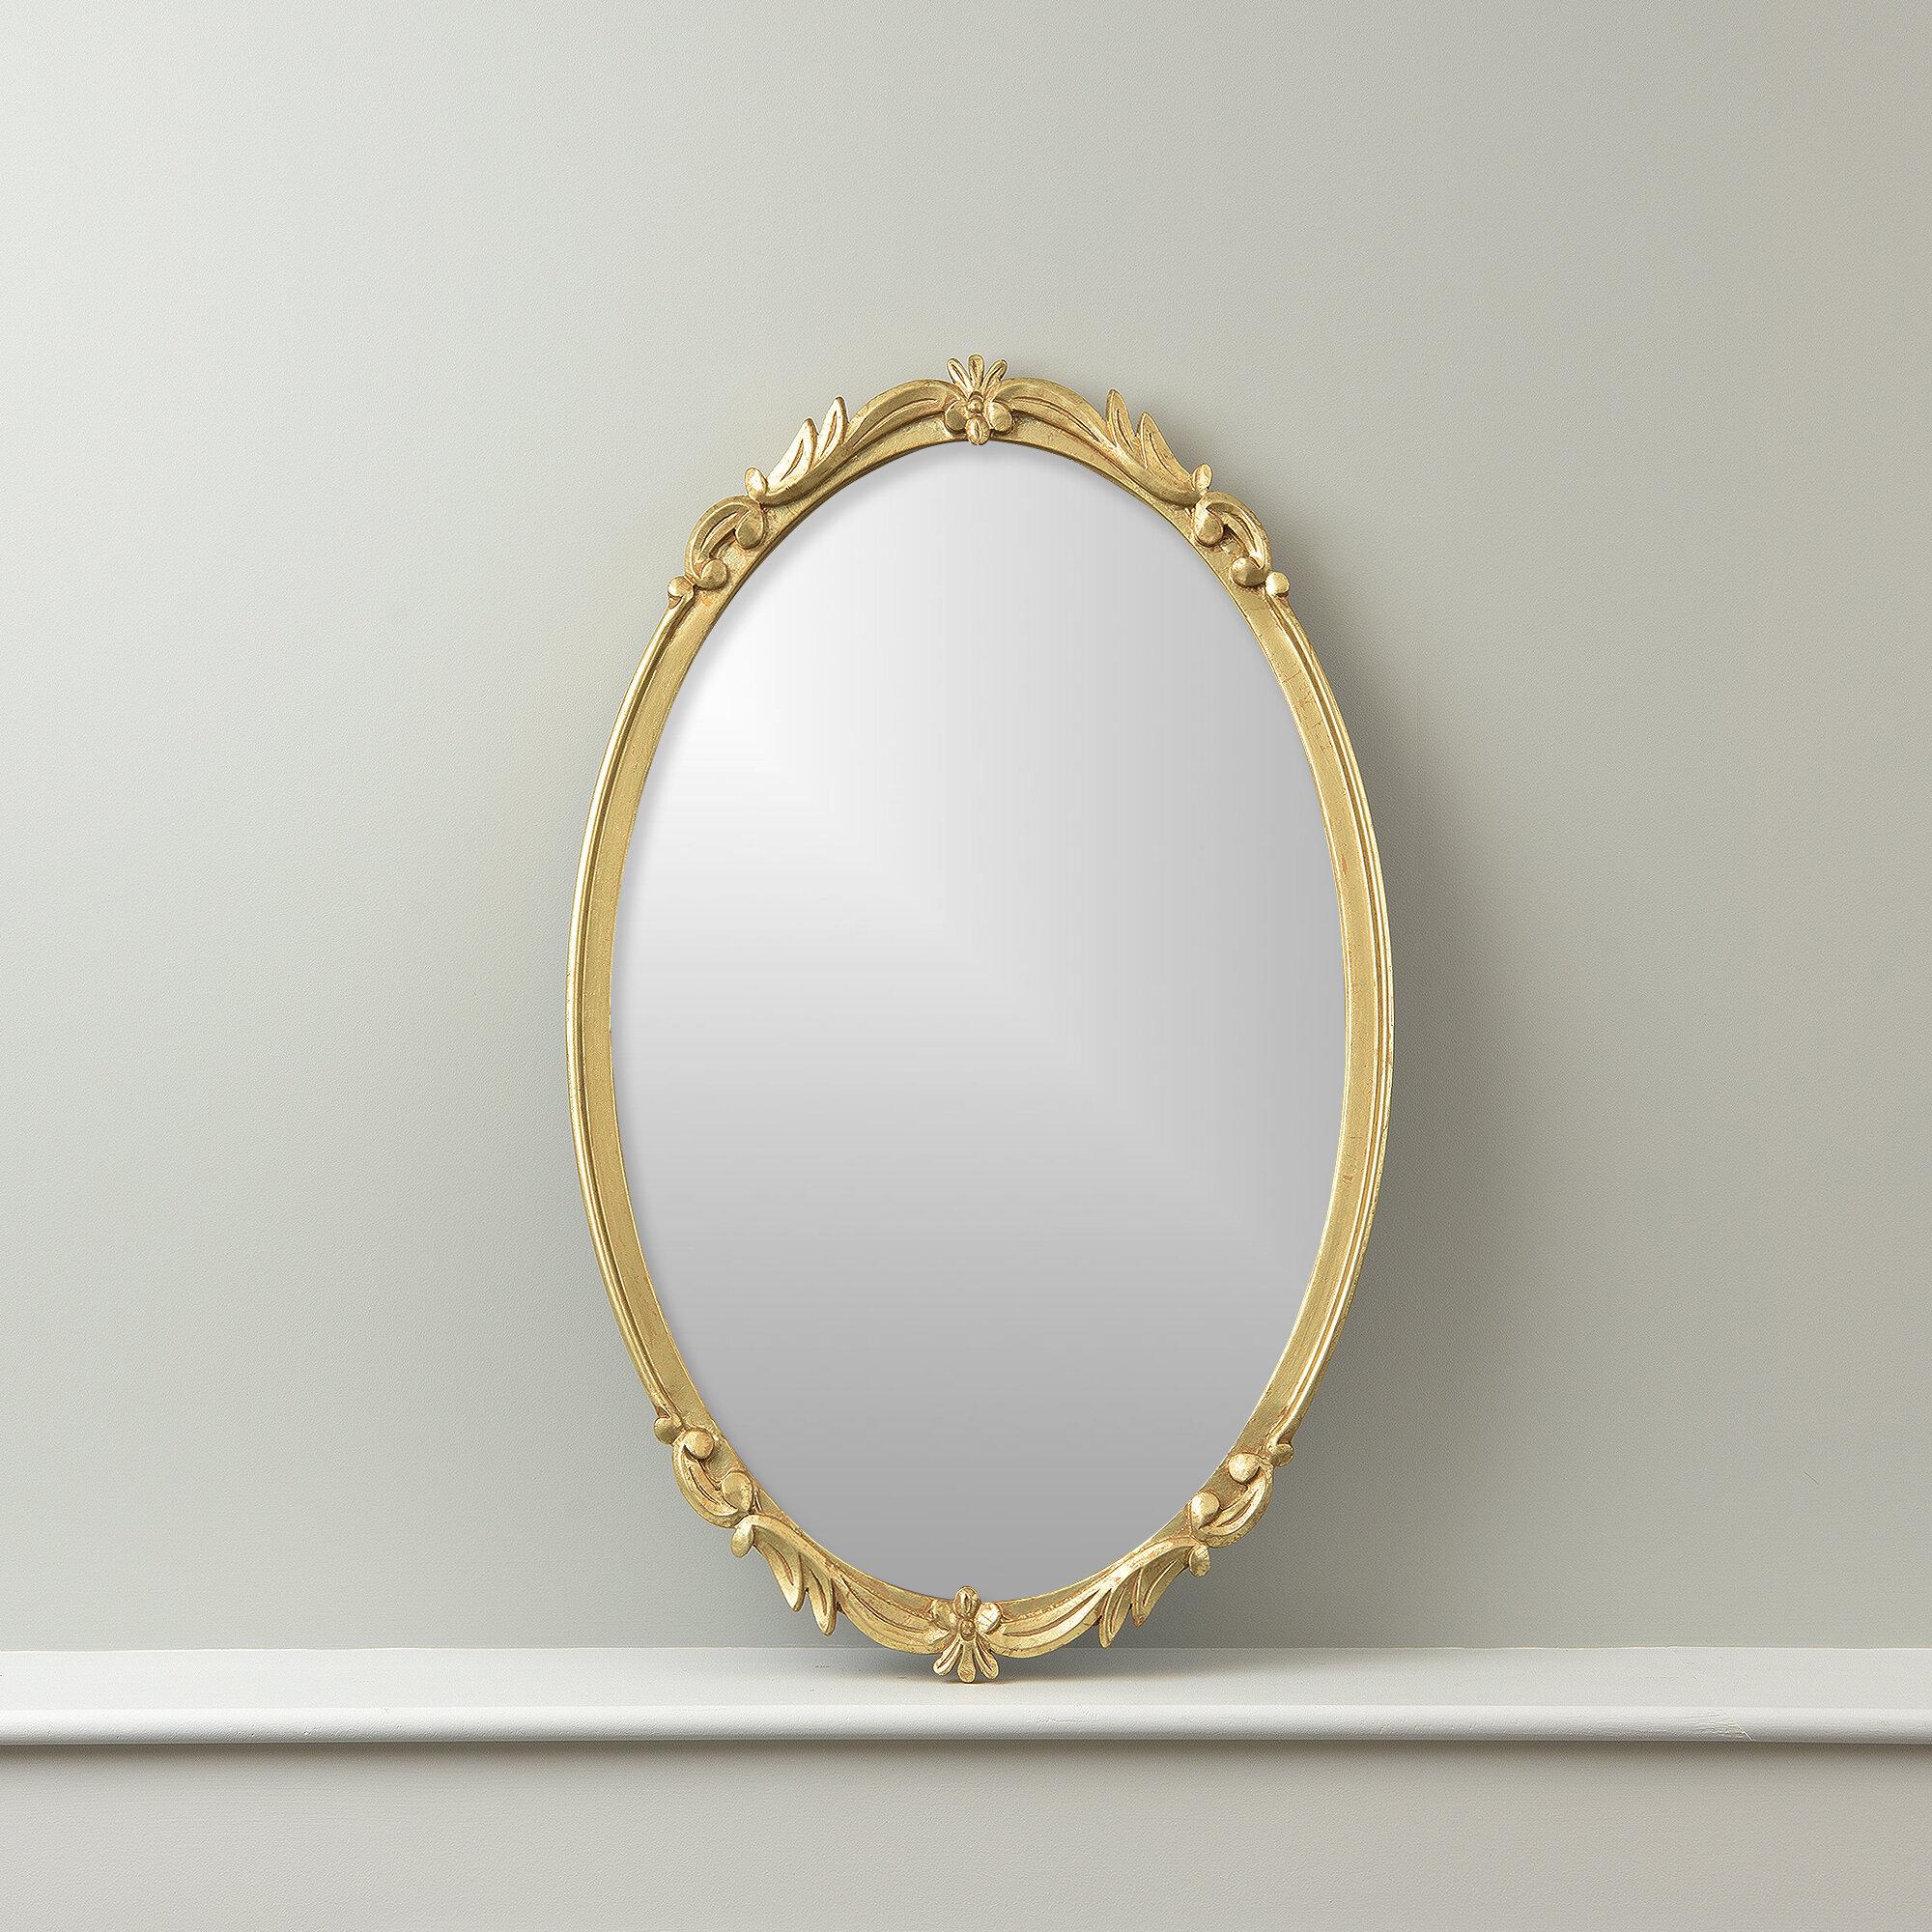 Astoria Grand Mirrors You Ll Love In 2021 Wayfair Ca